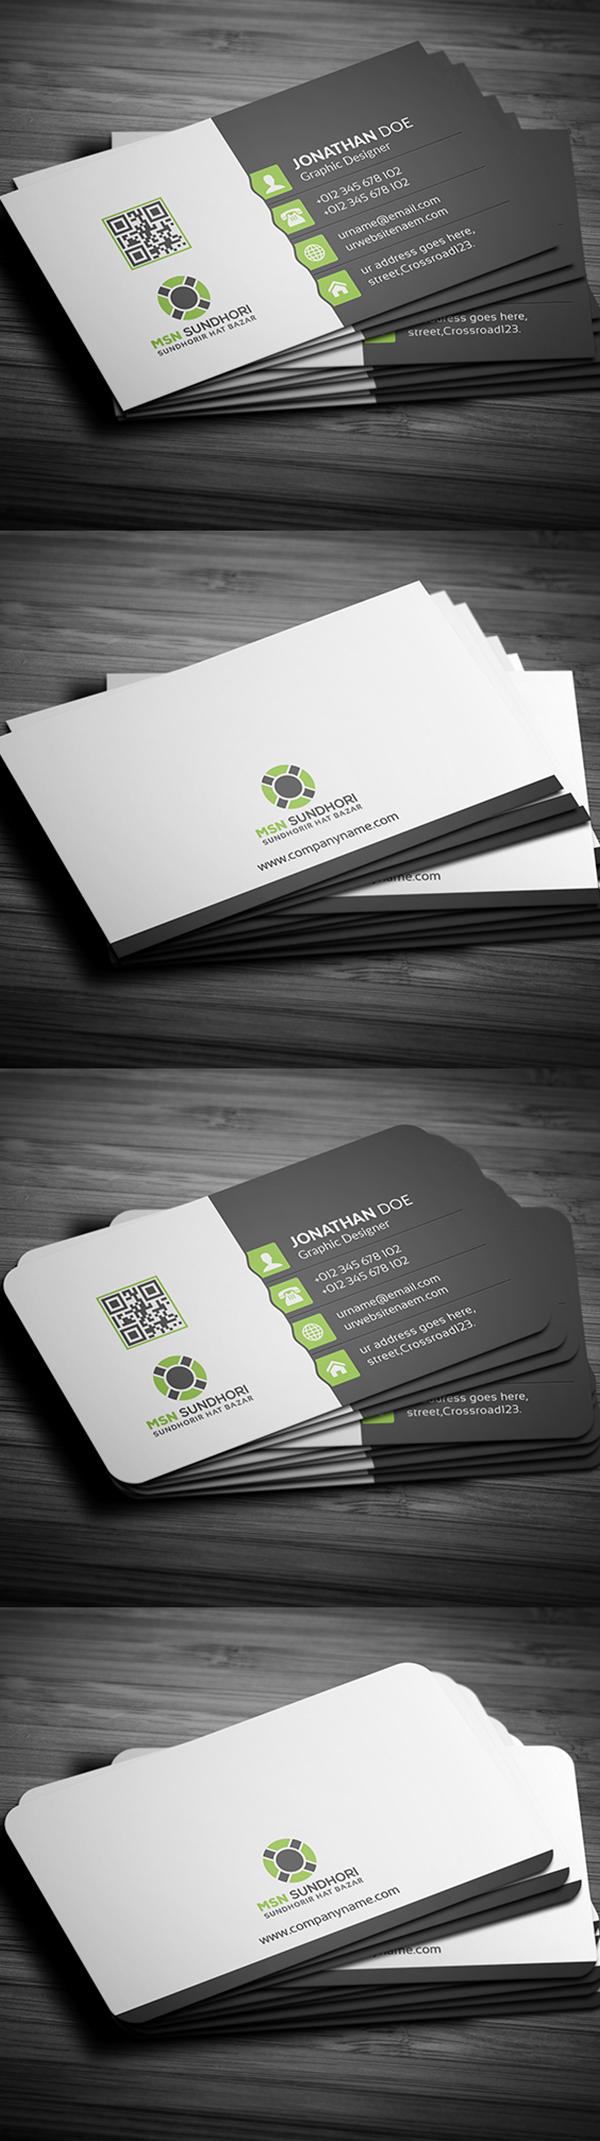 19 Business Card Design